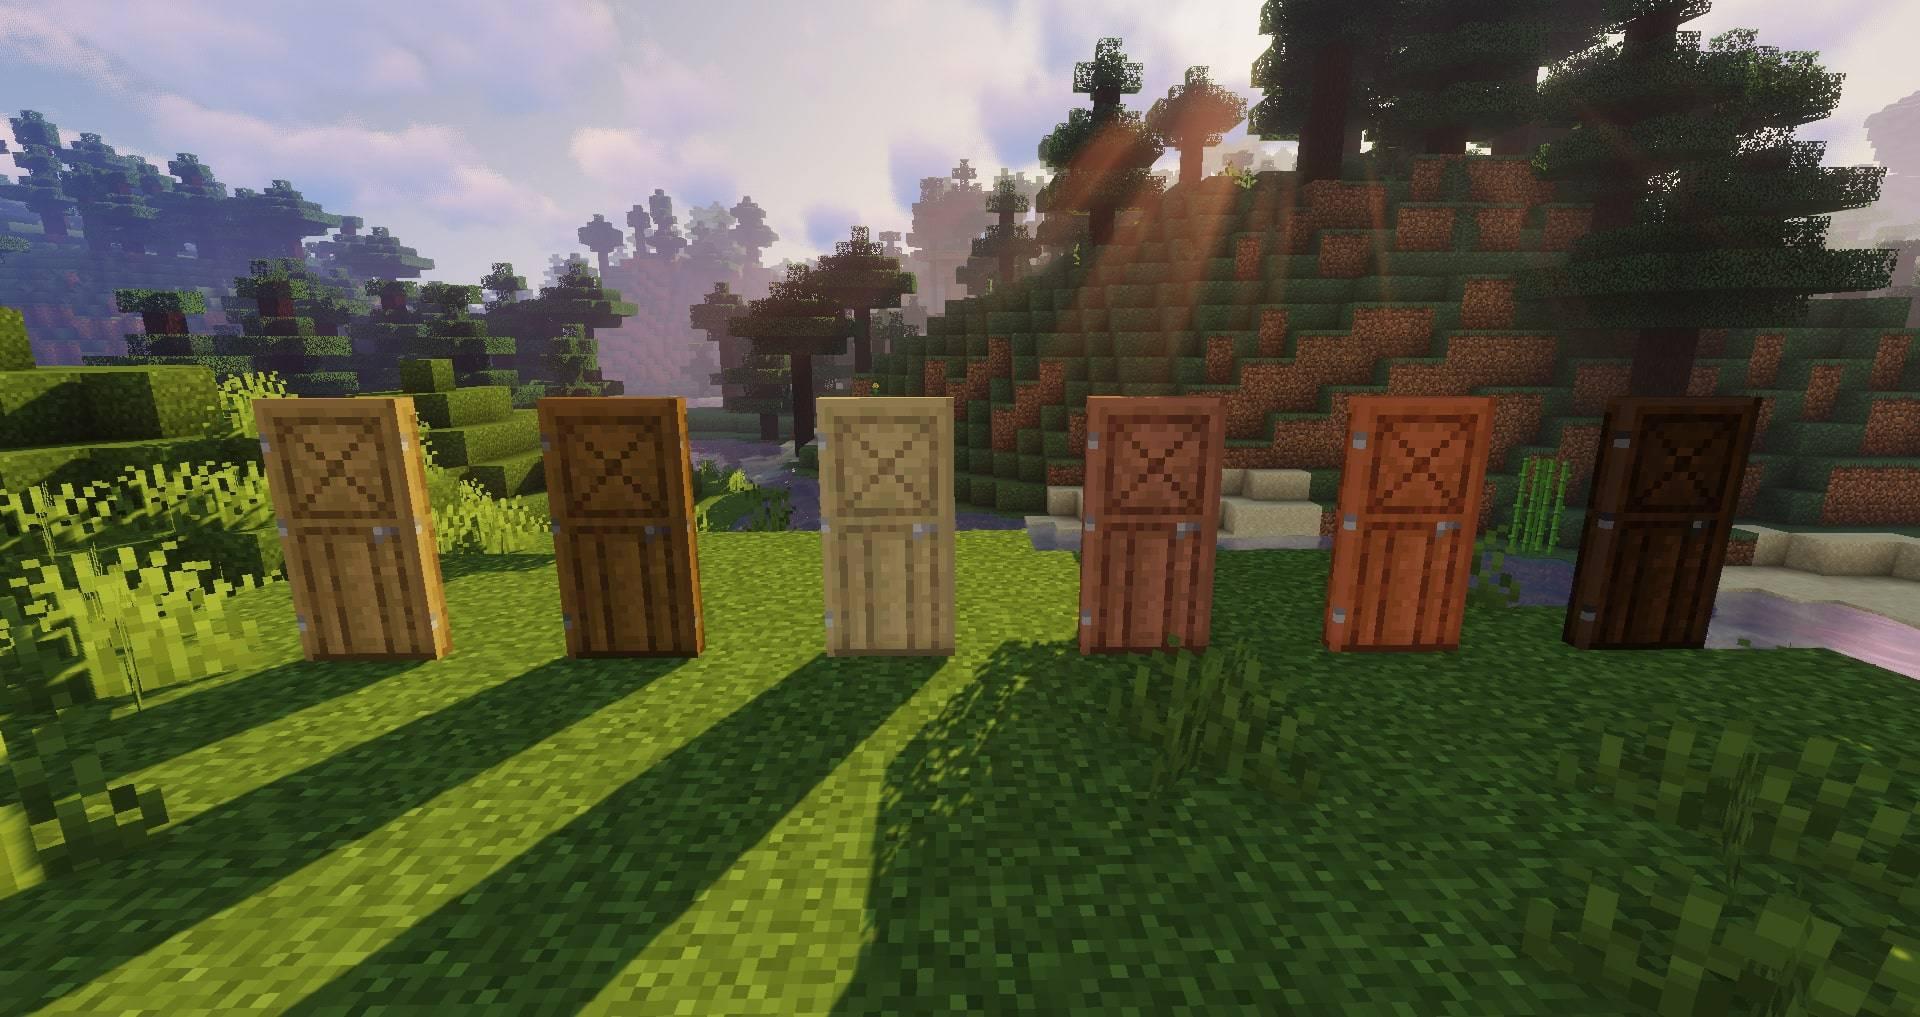 Macaw_s Doors mod for minecraft 25